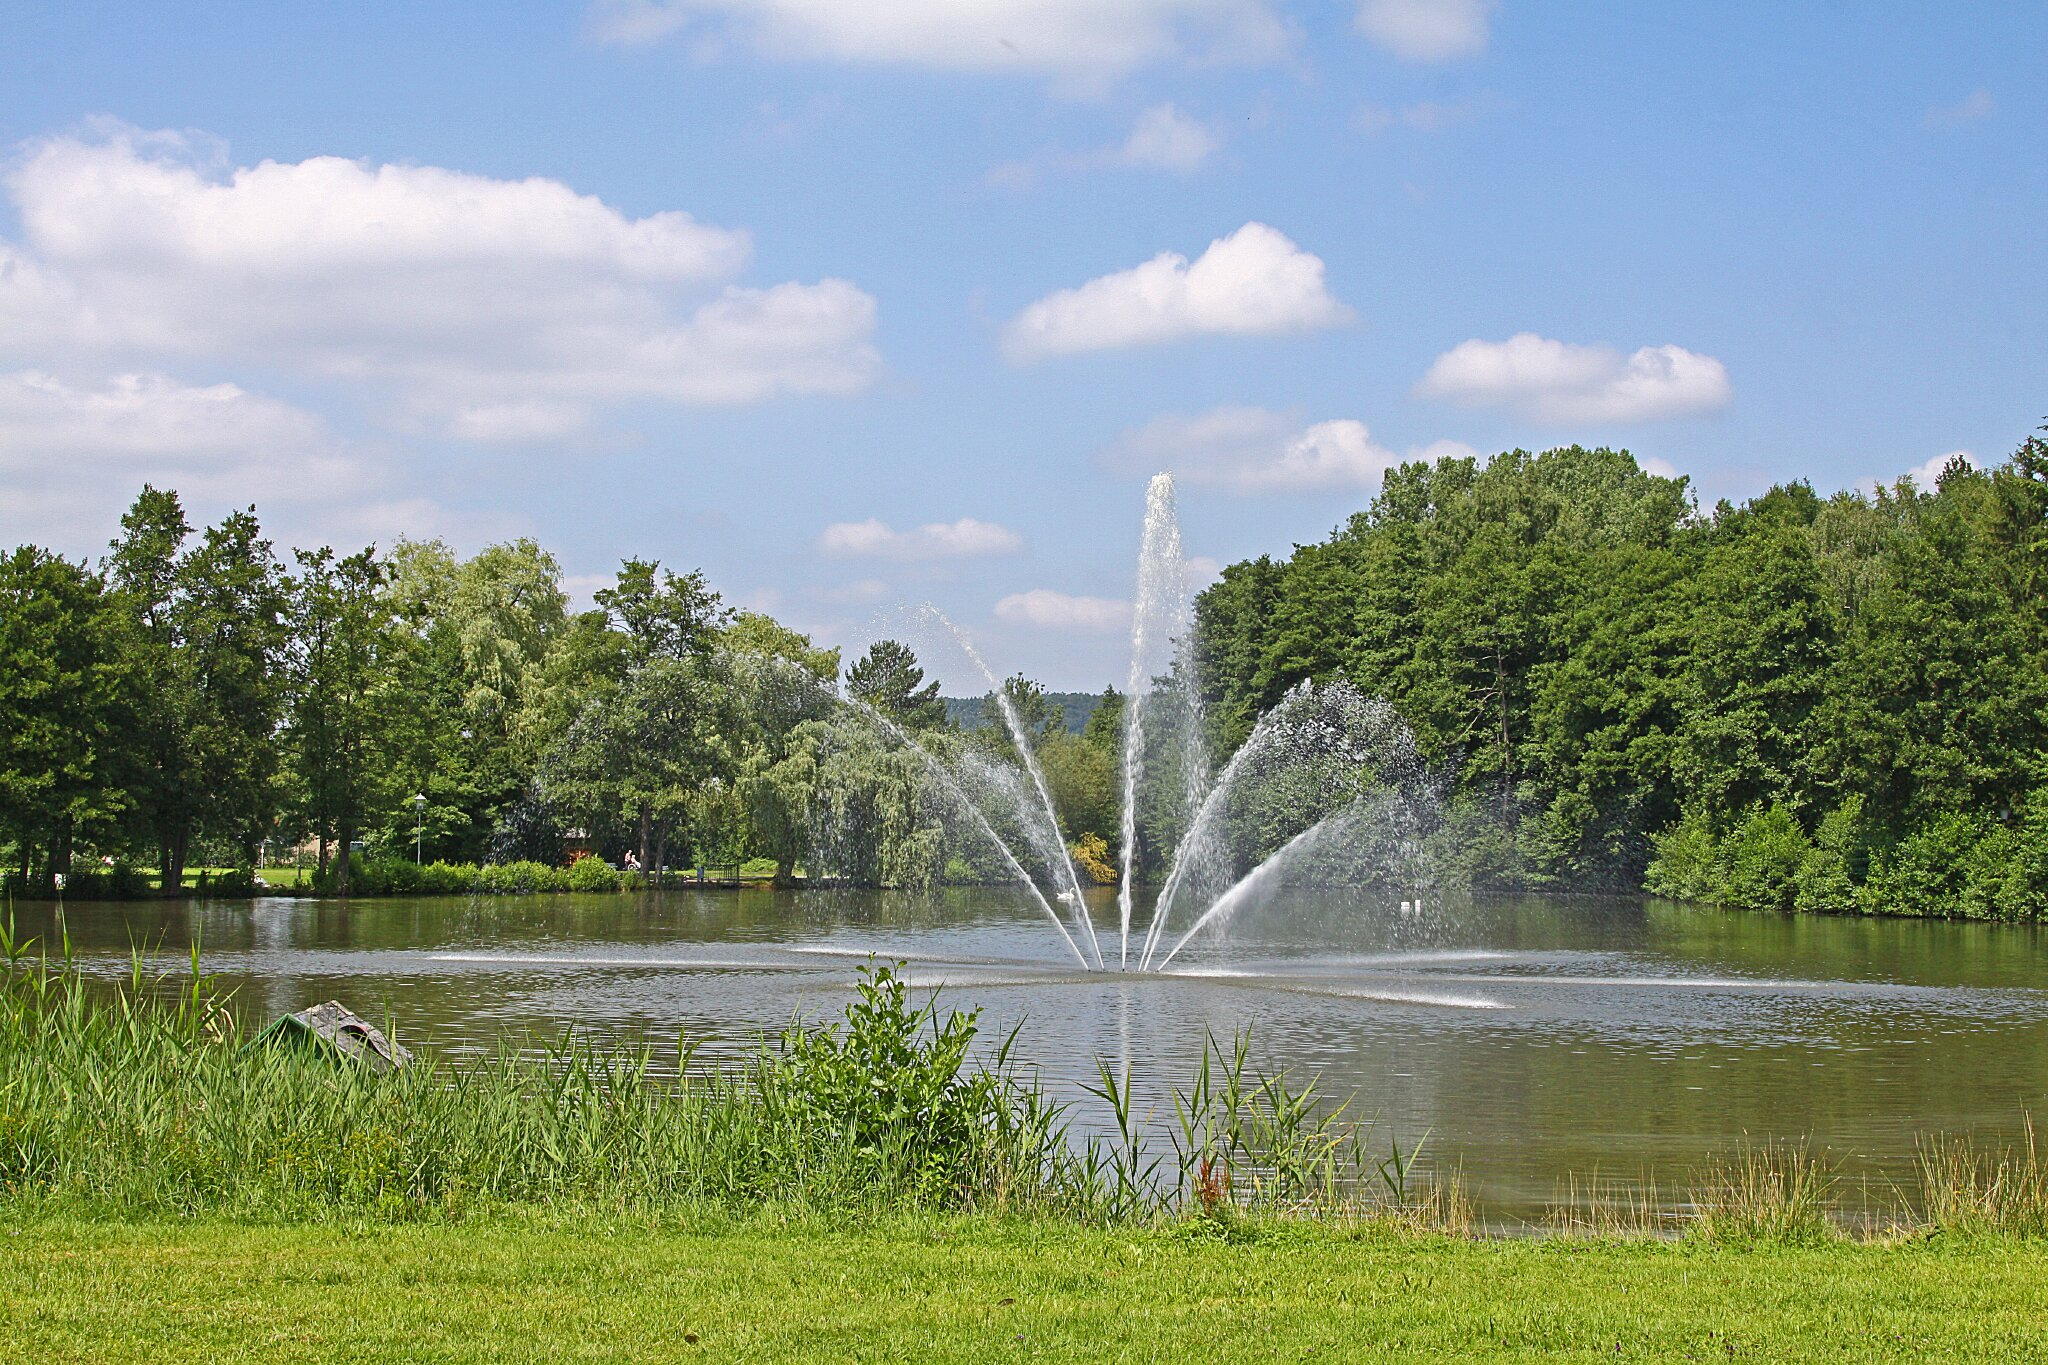 Großer Kurpark in Bad König Fontaine